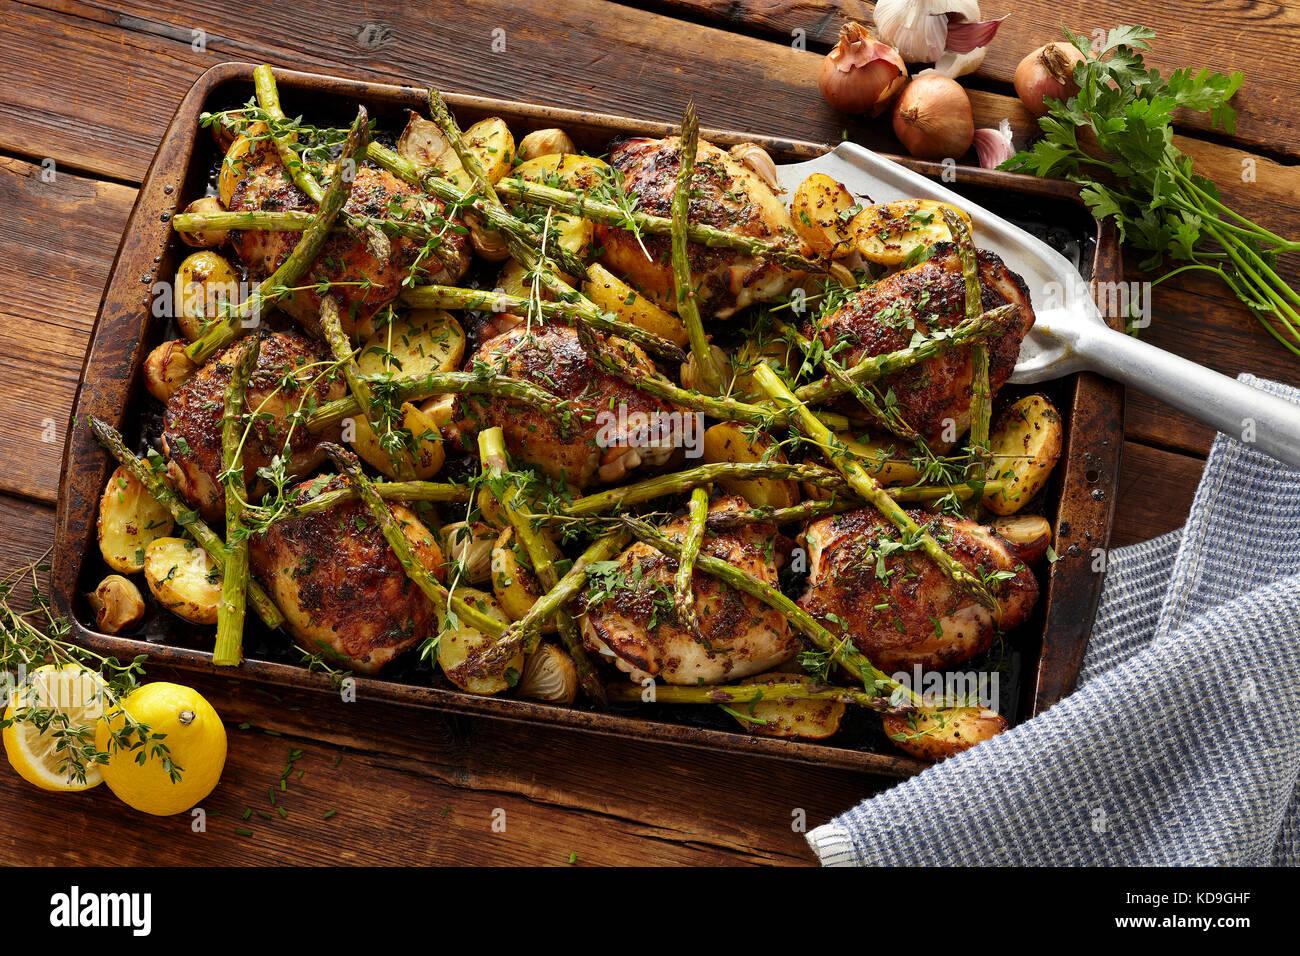 Sheet-pan honey Dijon chicken and asparagus - Stock Image